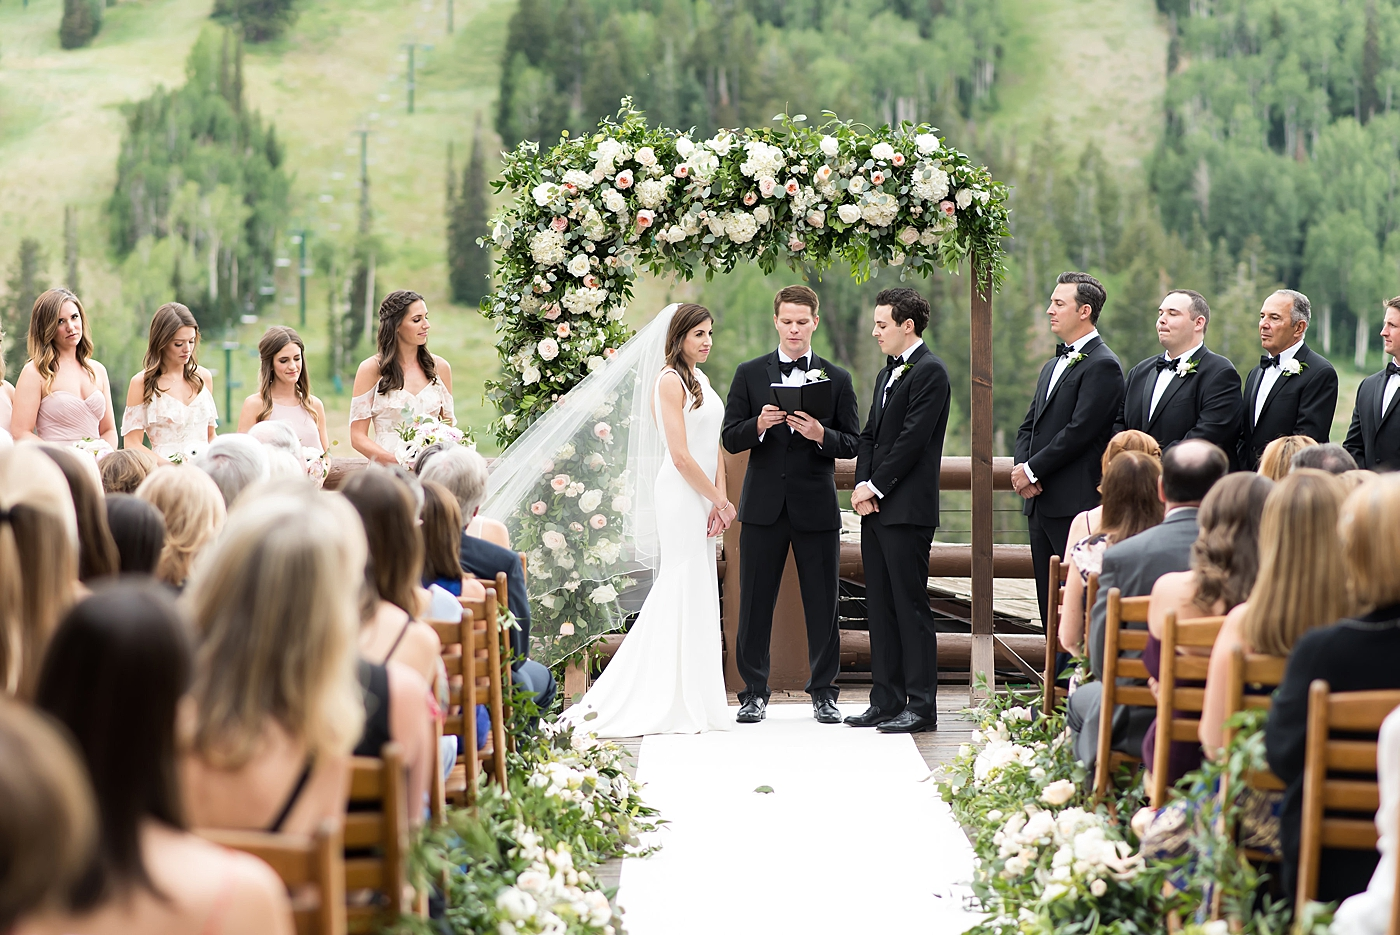 Romantic Mountain Wedding_Deer Valley Weddings_Park City Wedding Planner_MelissaFancy_0093.jpg